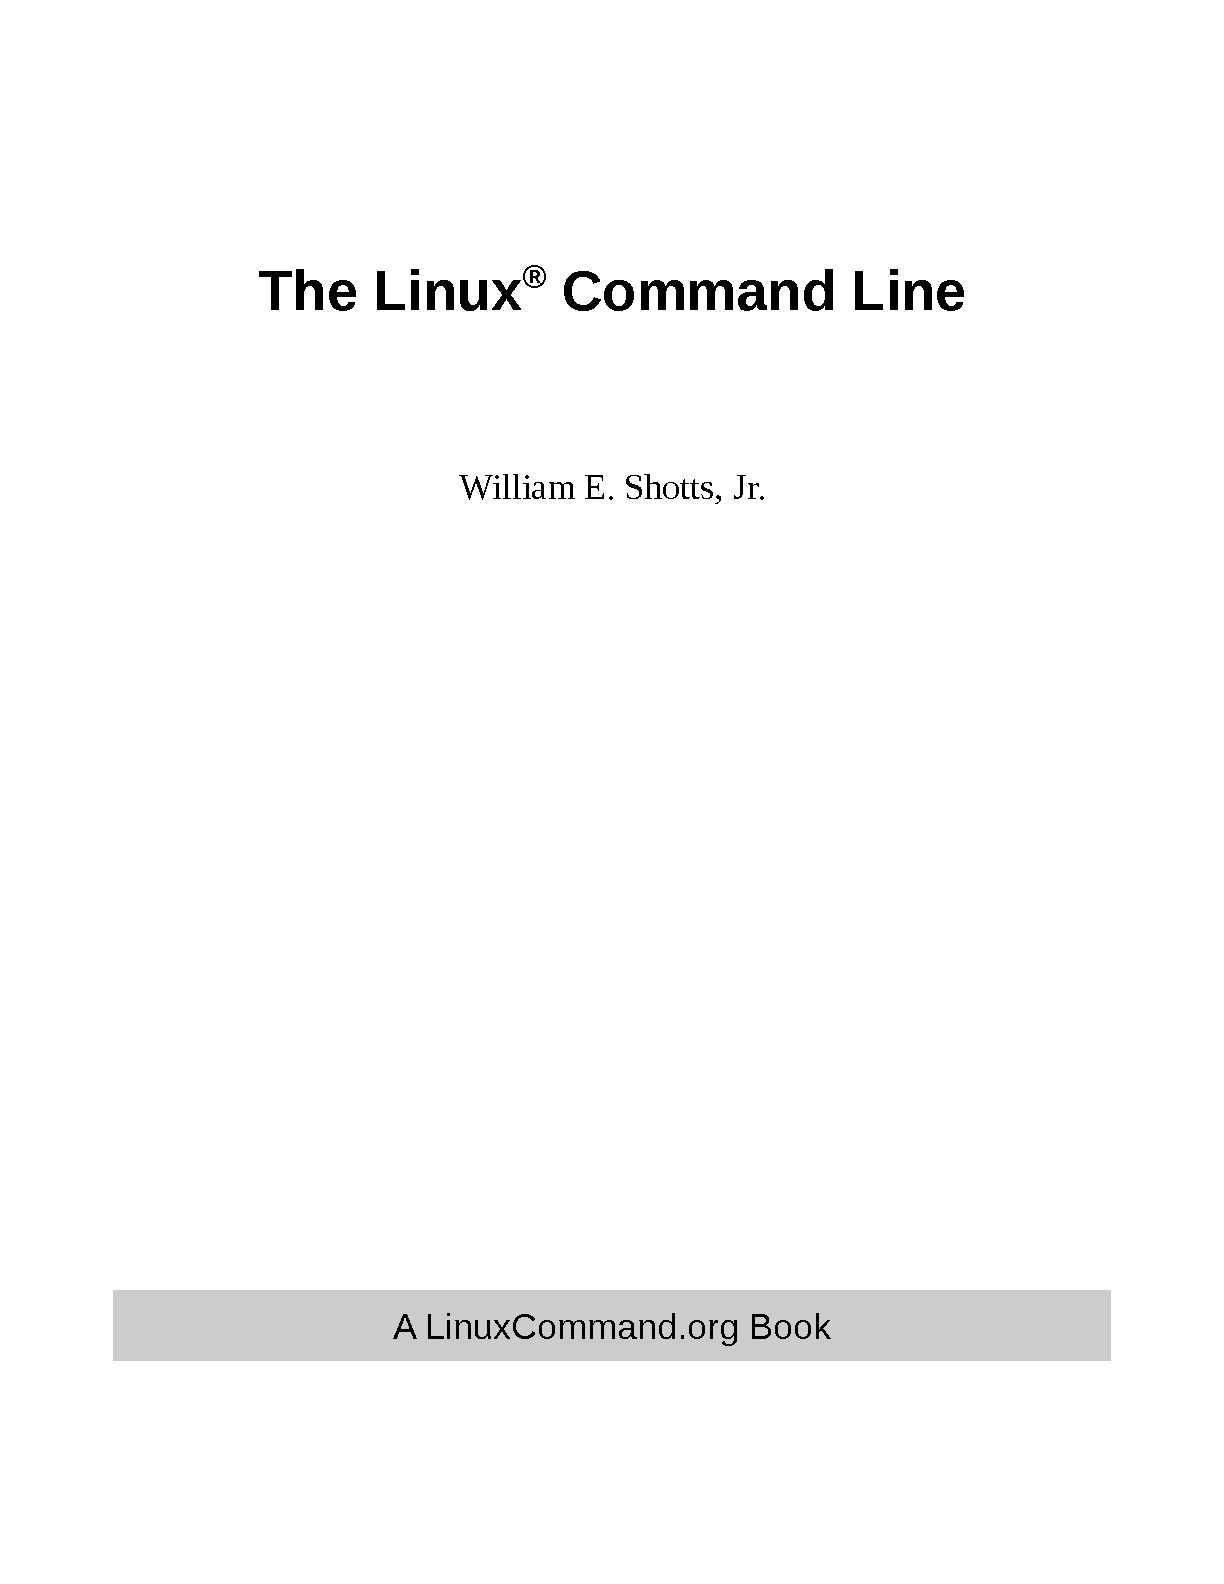 Calaméo - The Linux Command Line